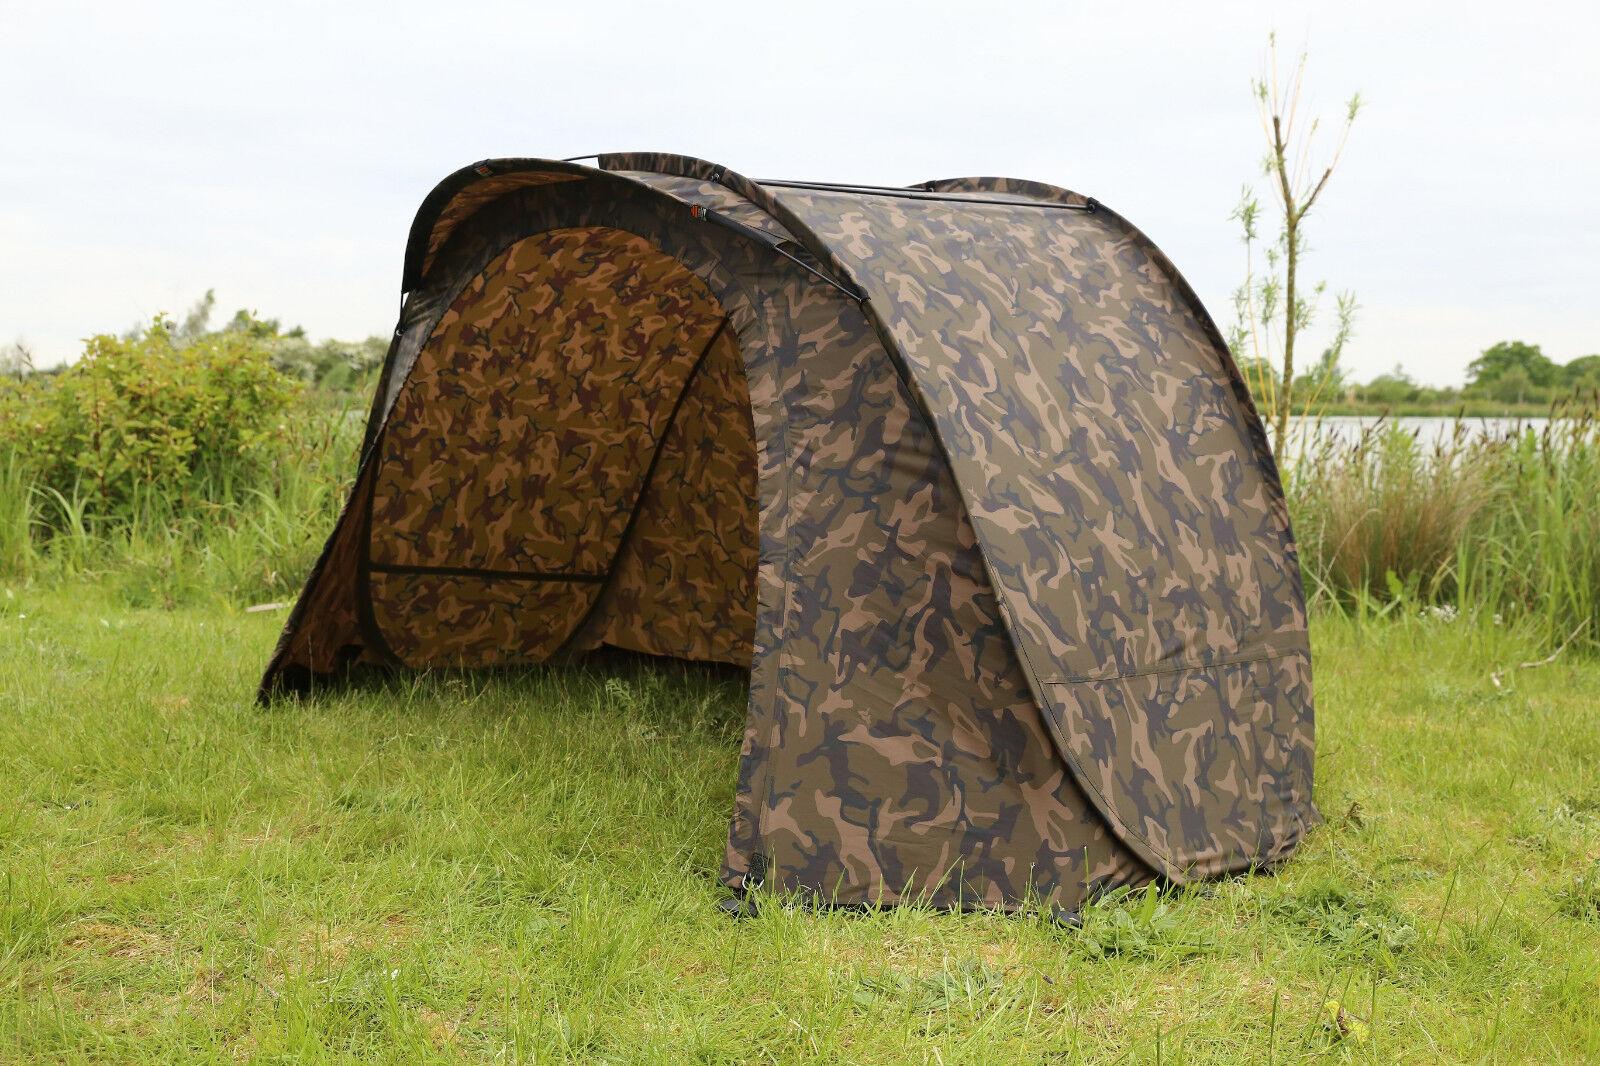 Fox EASY Shelter CAMO cum187 Ruck Zuck Tenda Tenda Tenda Tenda Angel tenda autopa TENDA Tent Bivvy c21